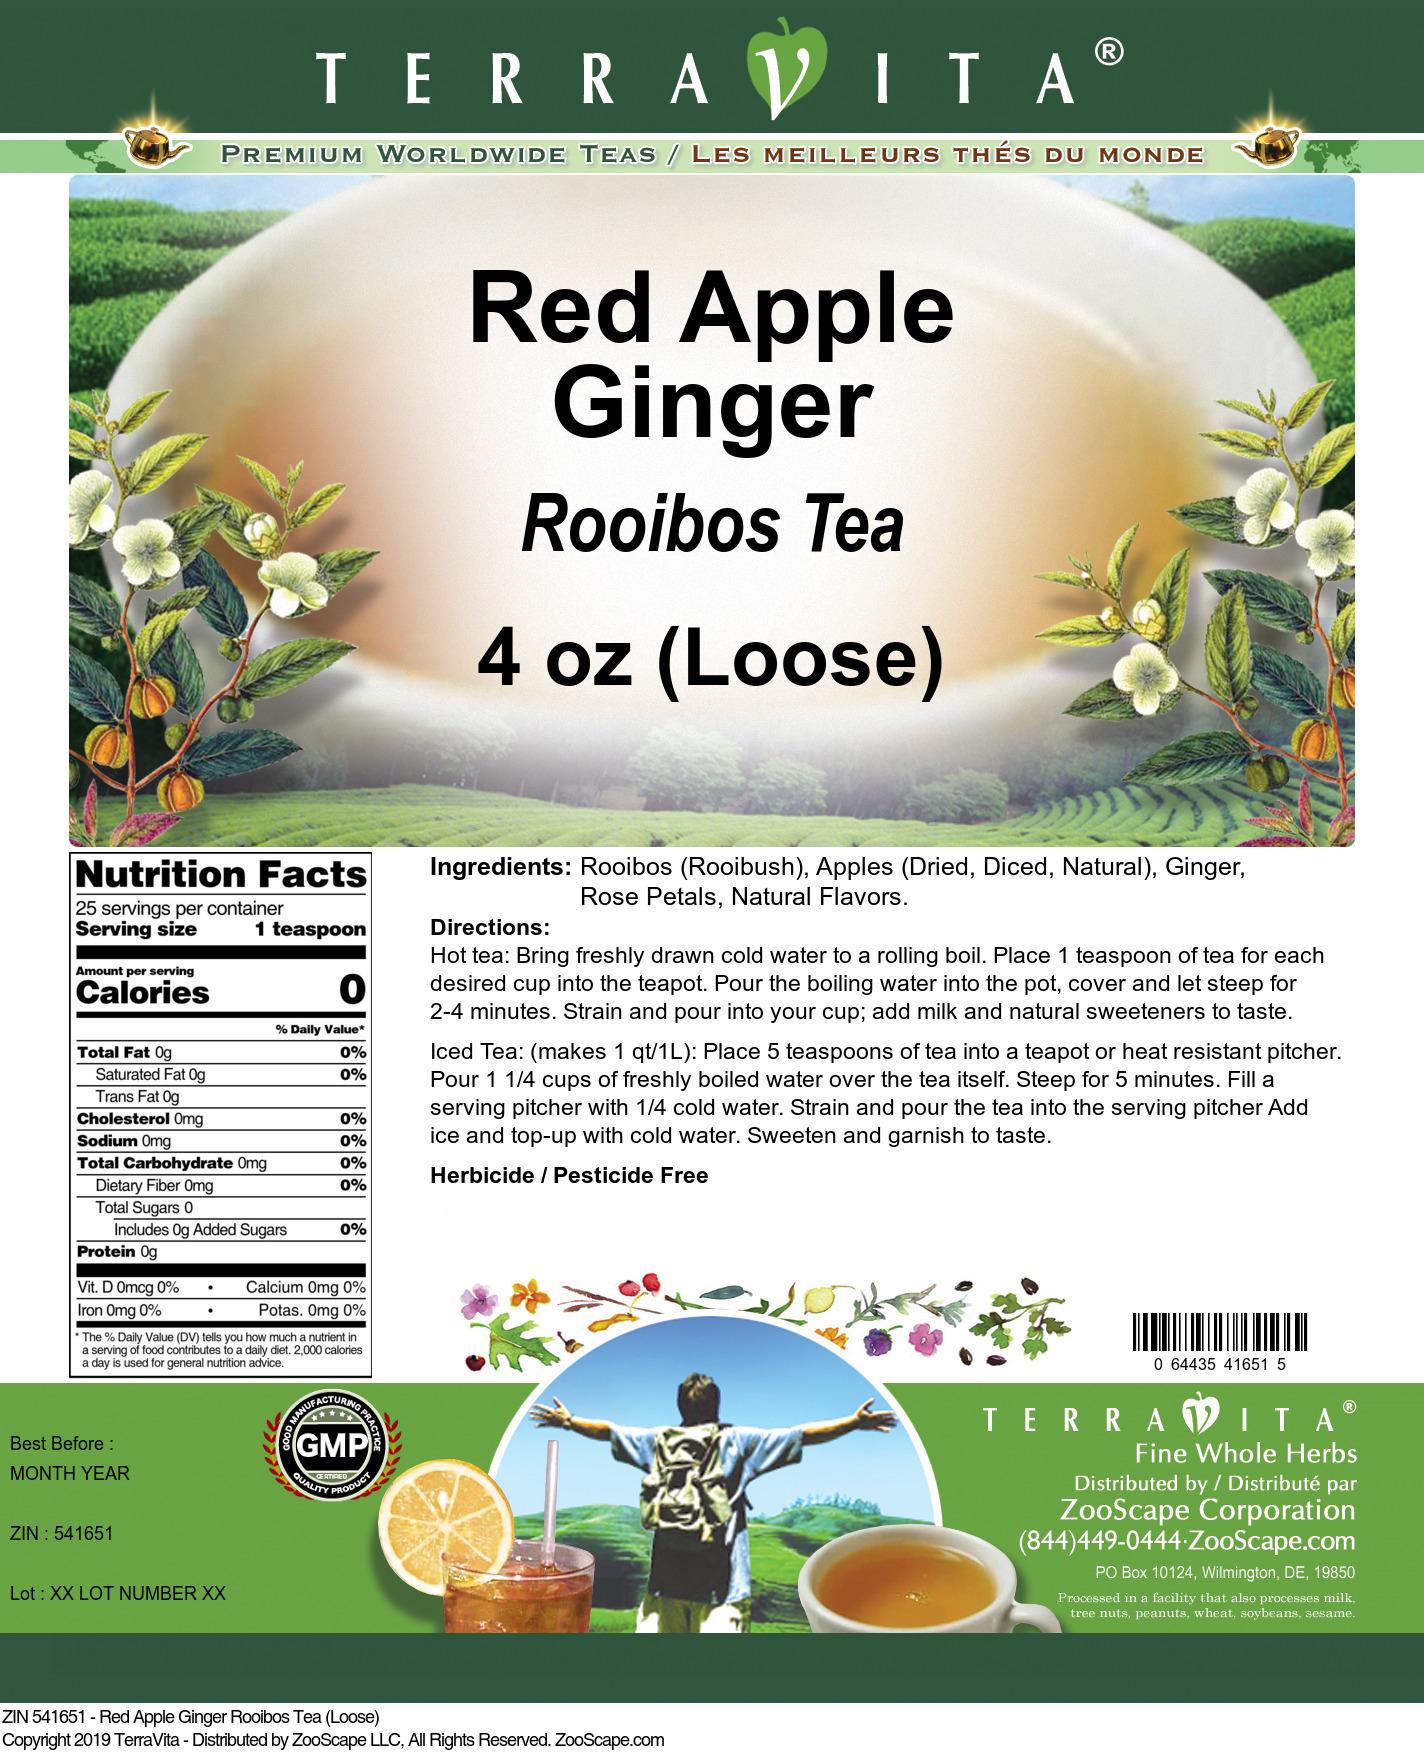 Red Apple Ginger Rooibos Tea (Loose)